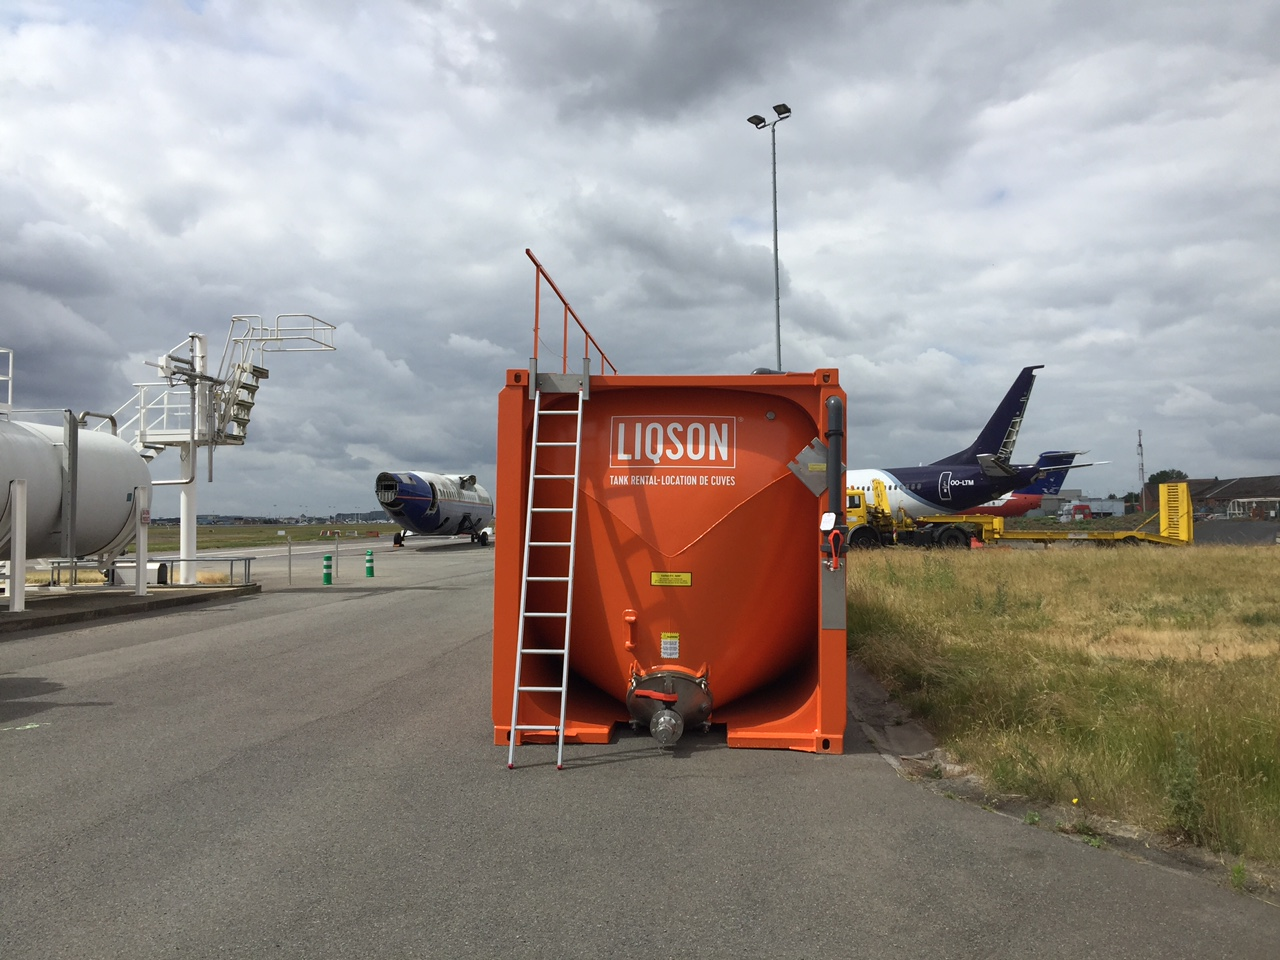 Opslagtank vliegtuig de-icing glycol